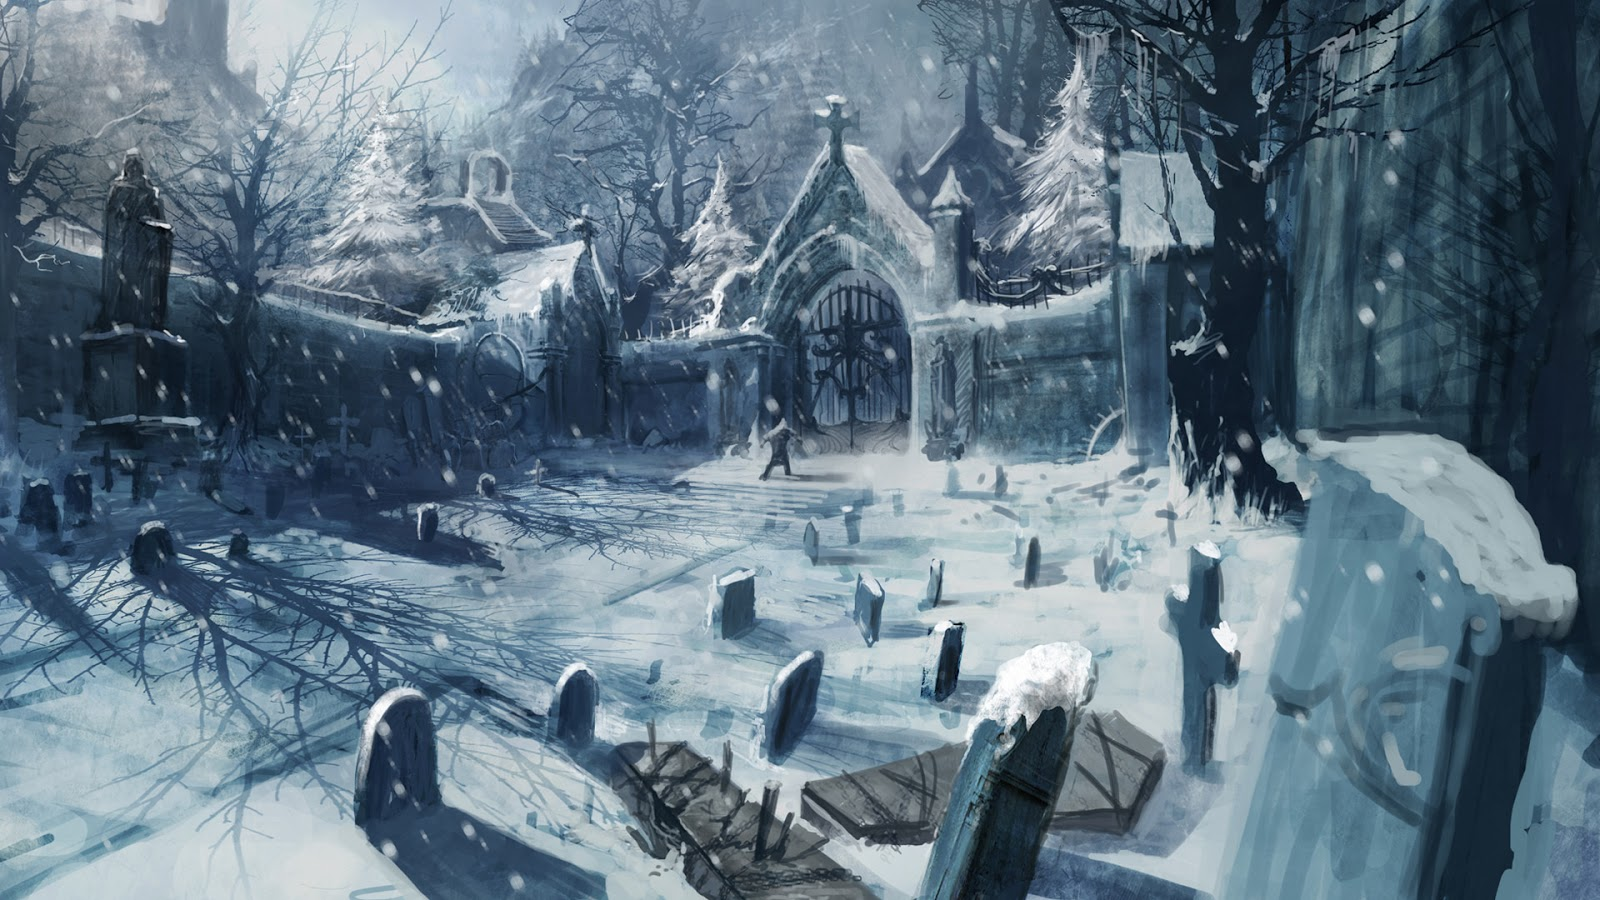 Creepy Fun Cemetery Scene Halloween Pinterest Something Wicked This Way Comes Sunday U0027s Sinister Snow